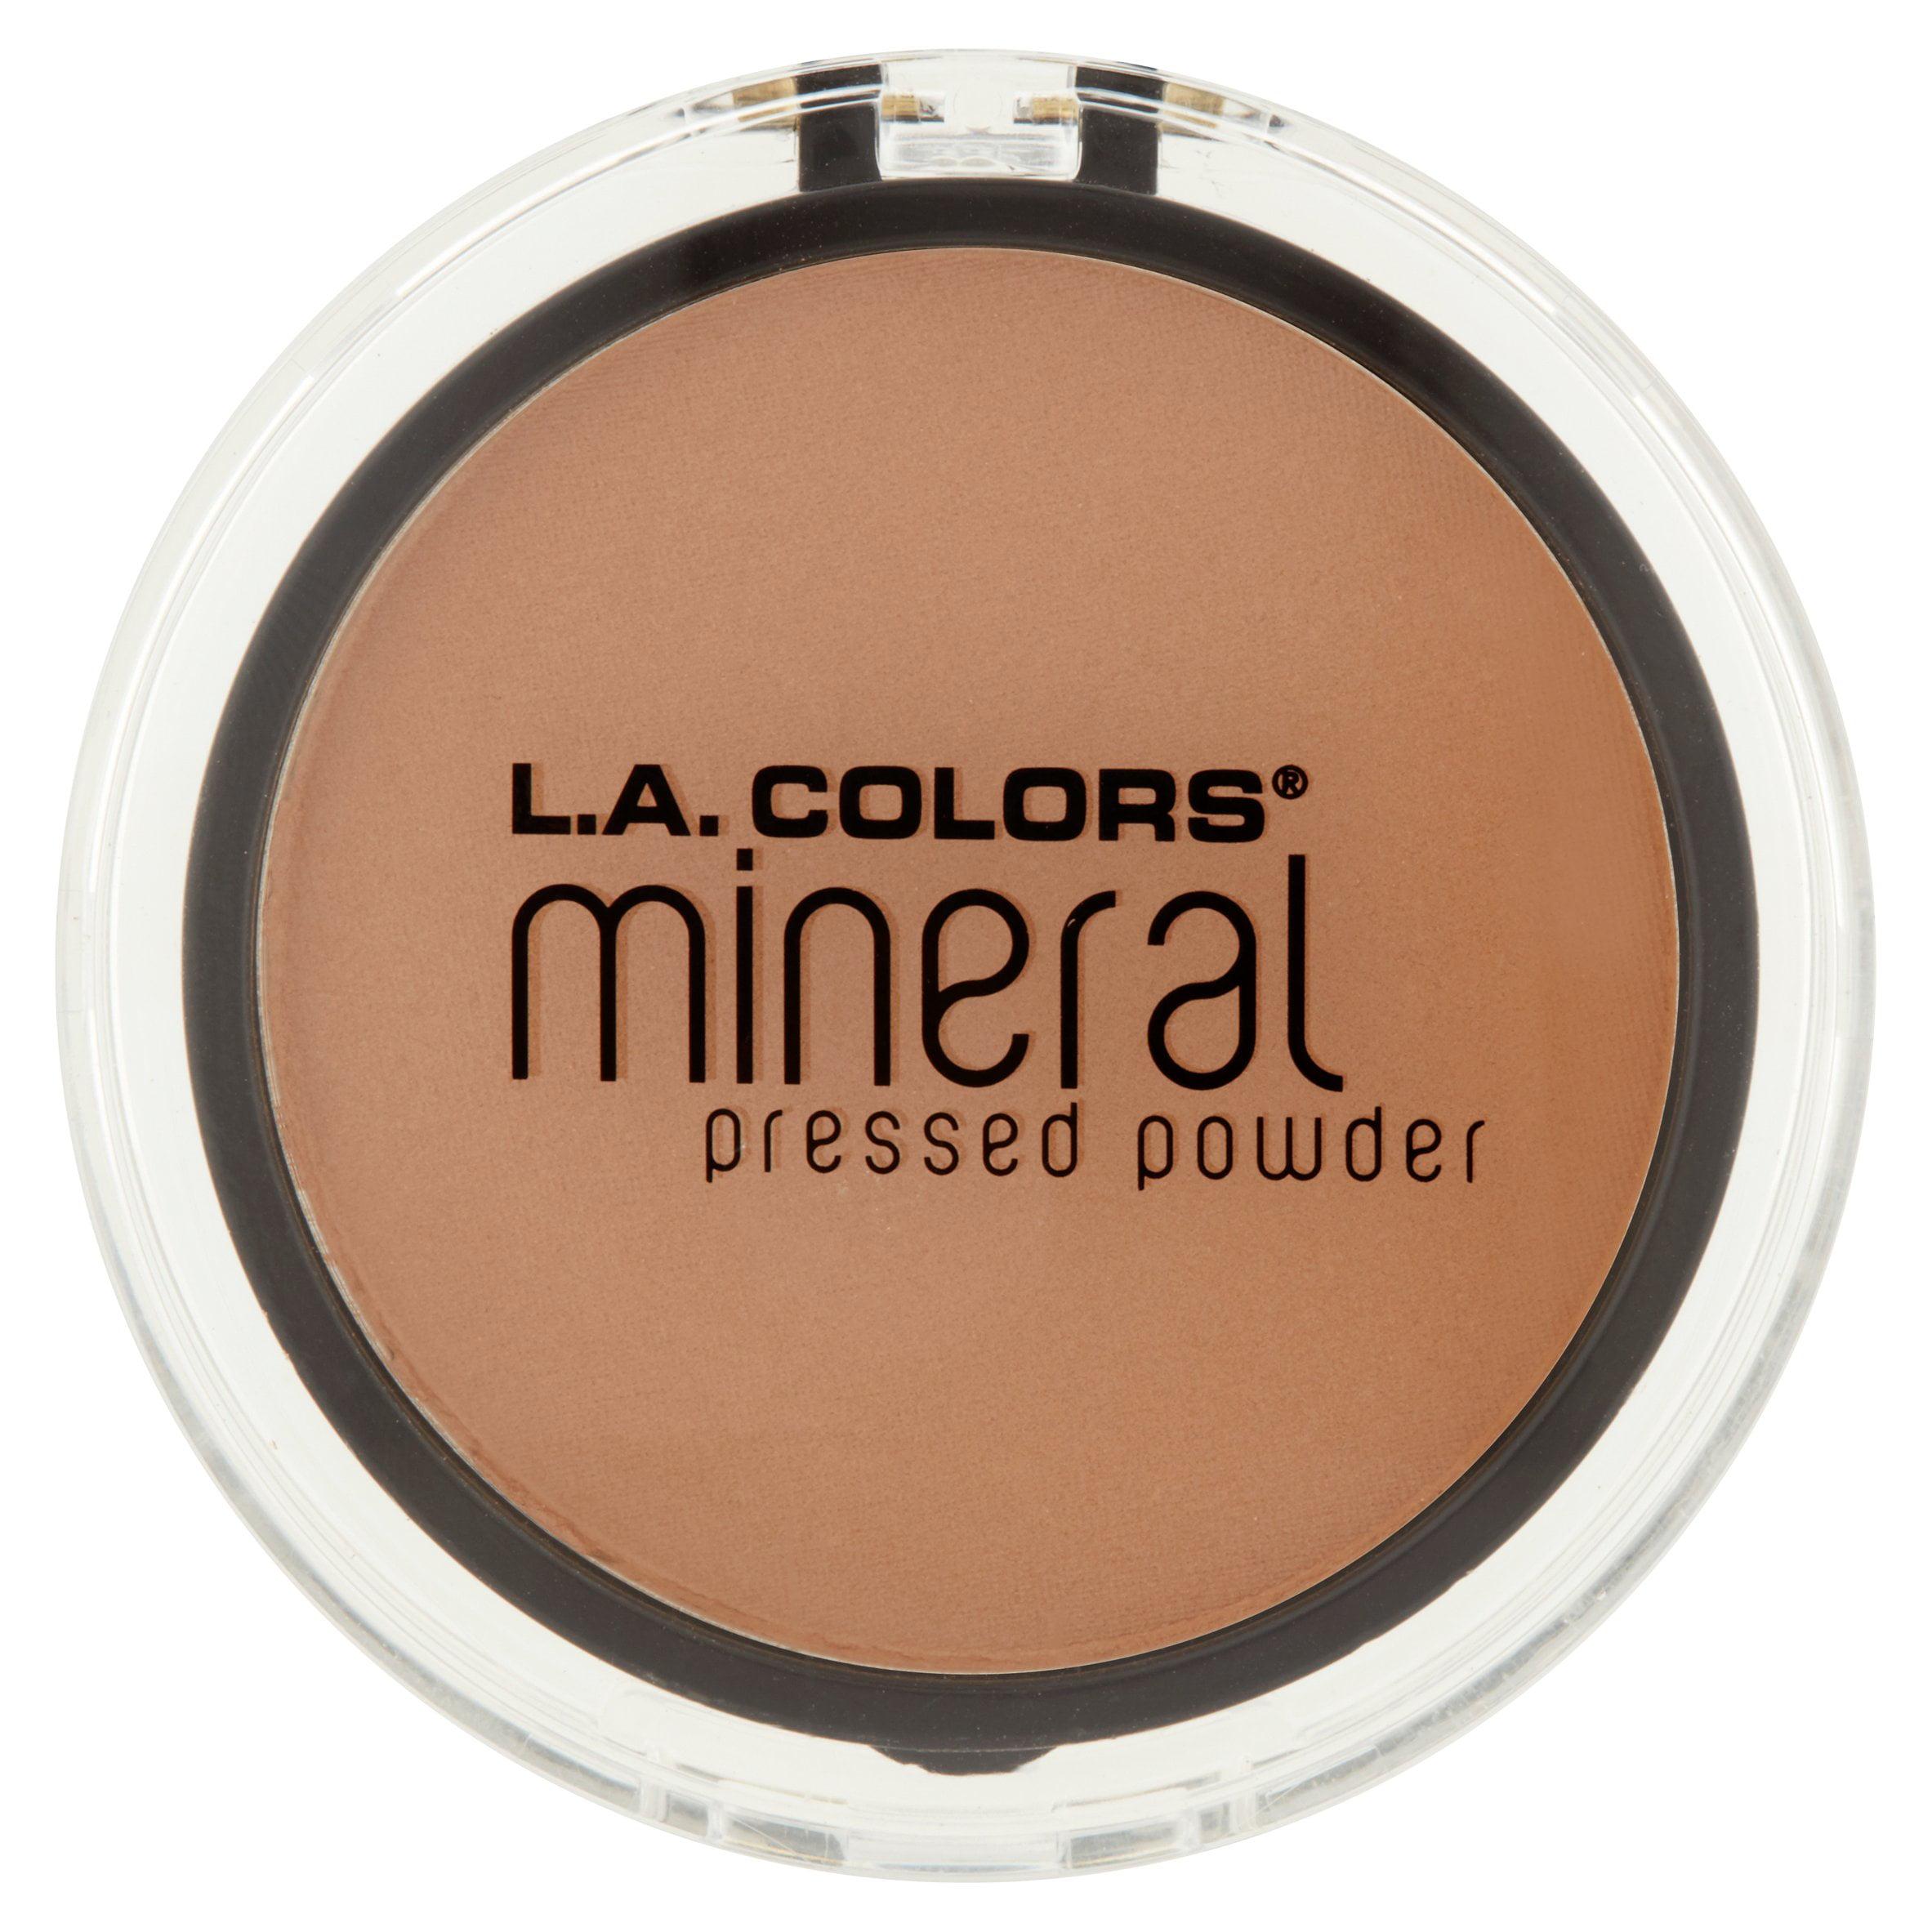 L.A. Colors Mineral Pressed Powder, Sand